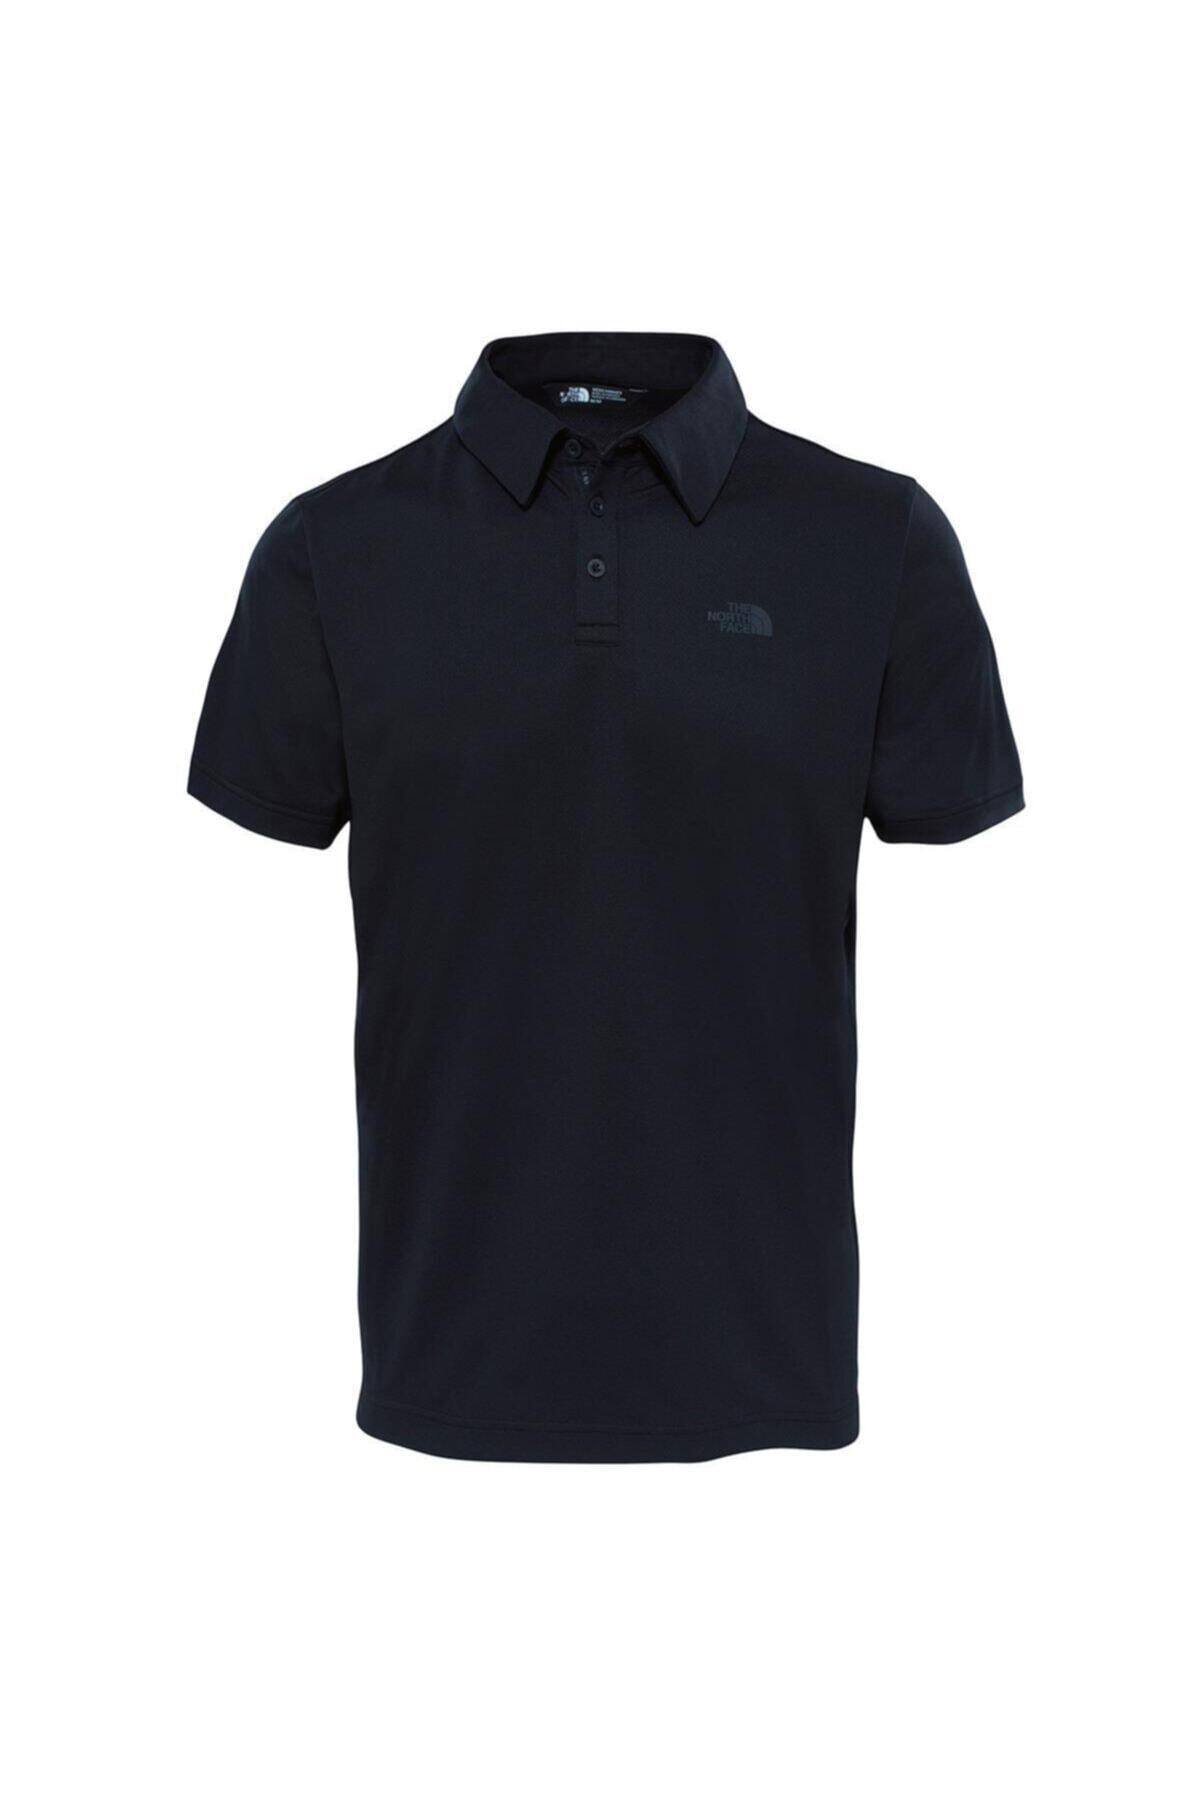 M TANKEN POLO Siyah Erkek Kısa Kol T-Shirt 100529832